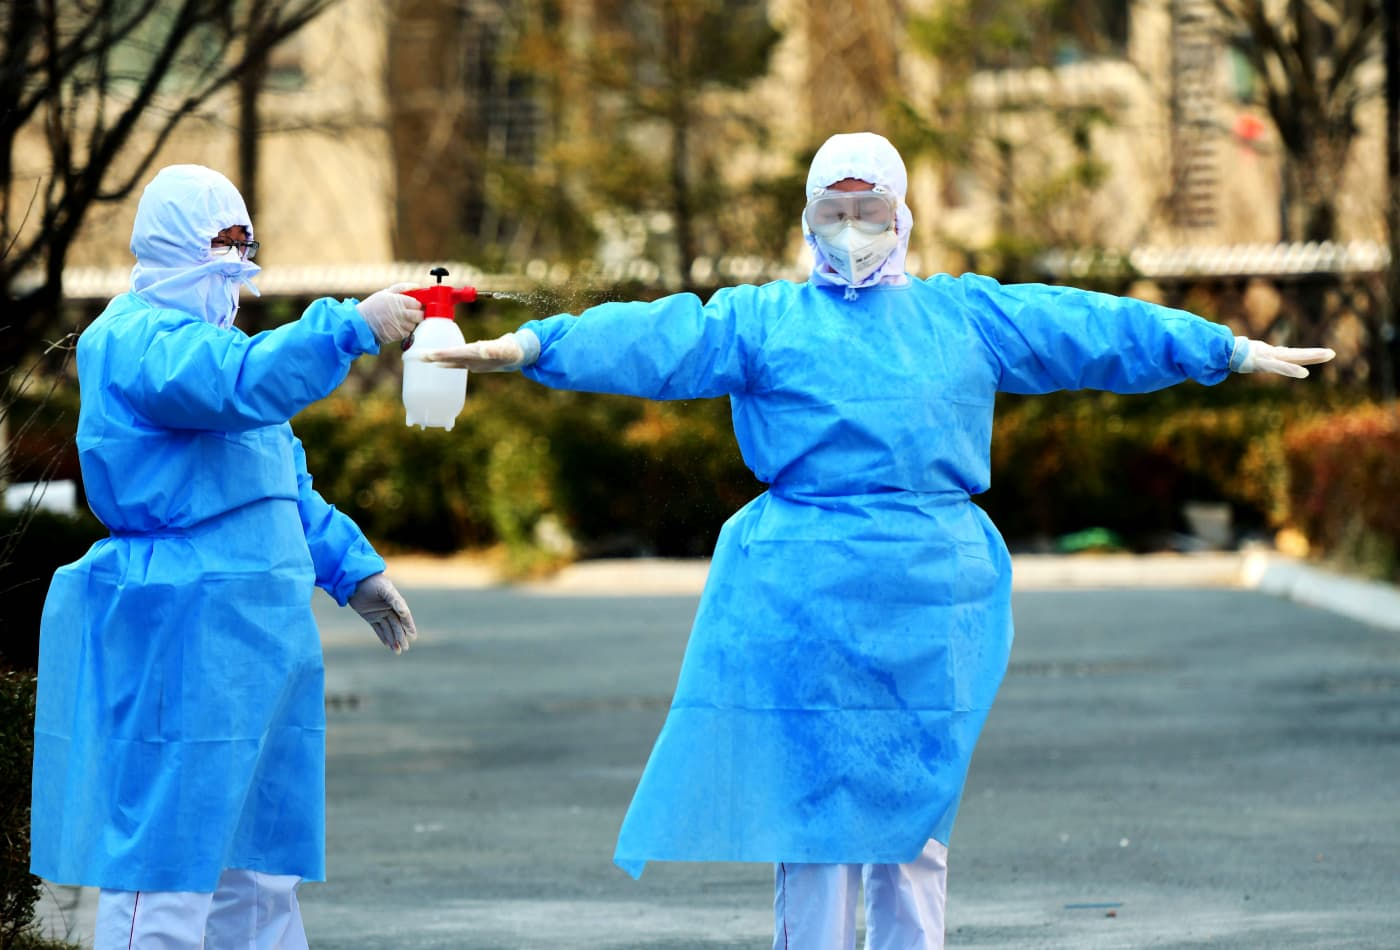 Coronavirus is going to 'paralyze China' — El-Erian warns against buying dips